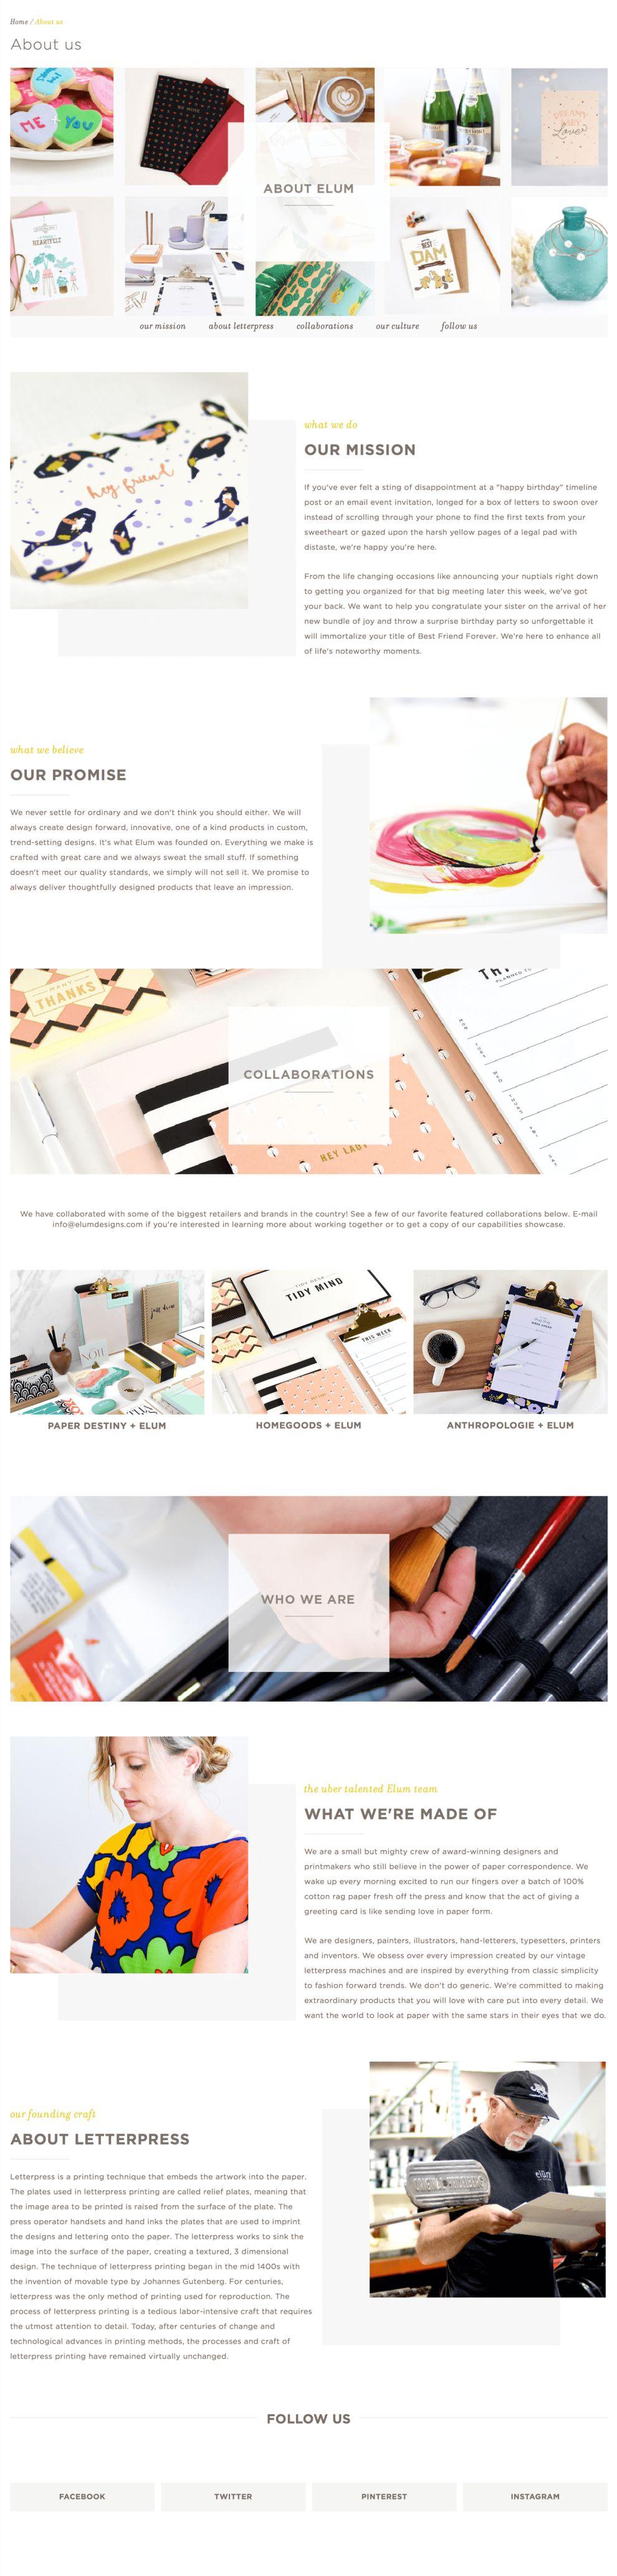 Elum Designs About Page